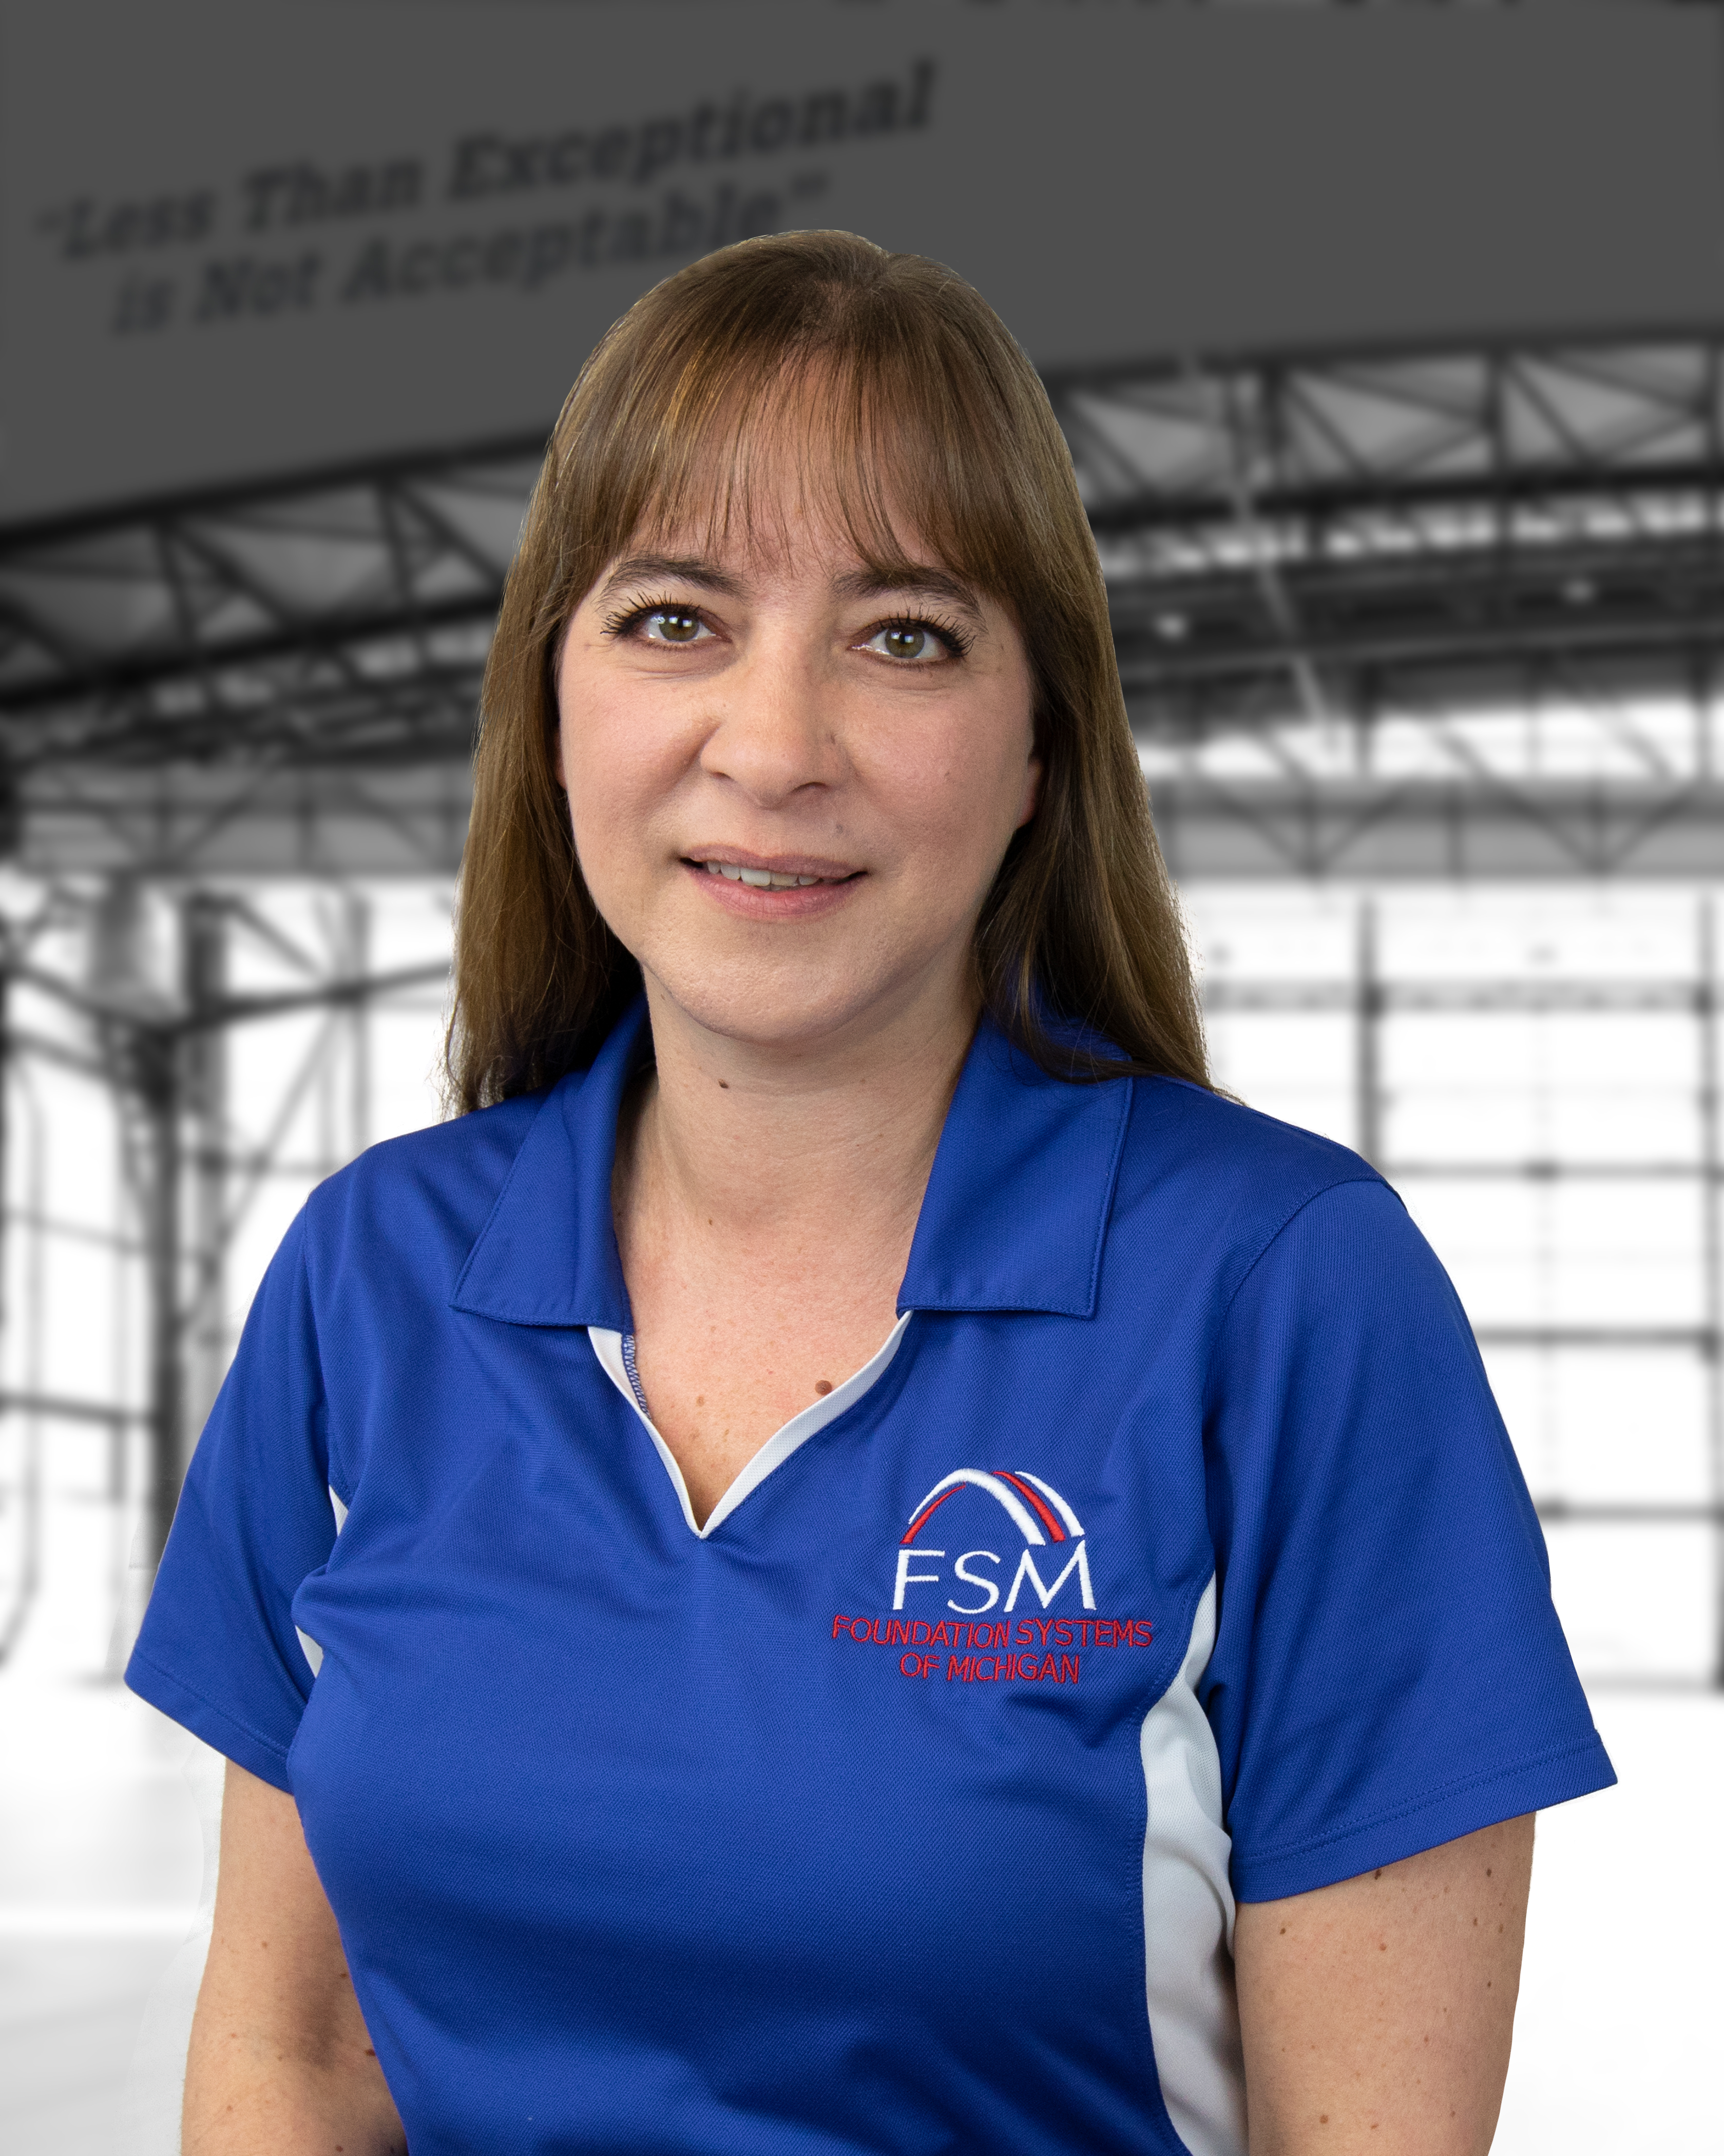 FSM Krista Tomaszewski Appointment Center Representative